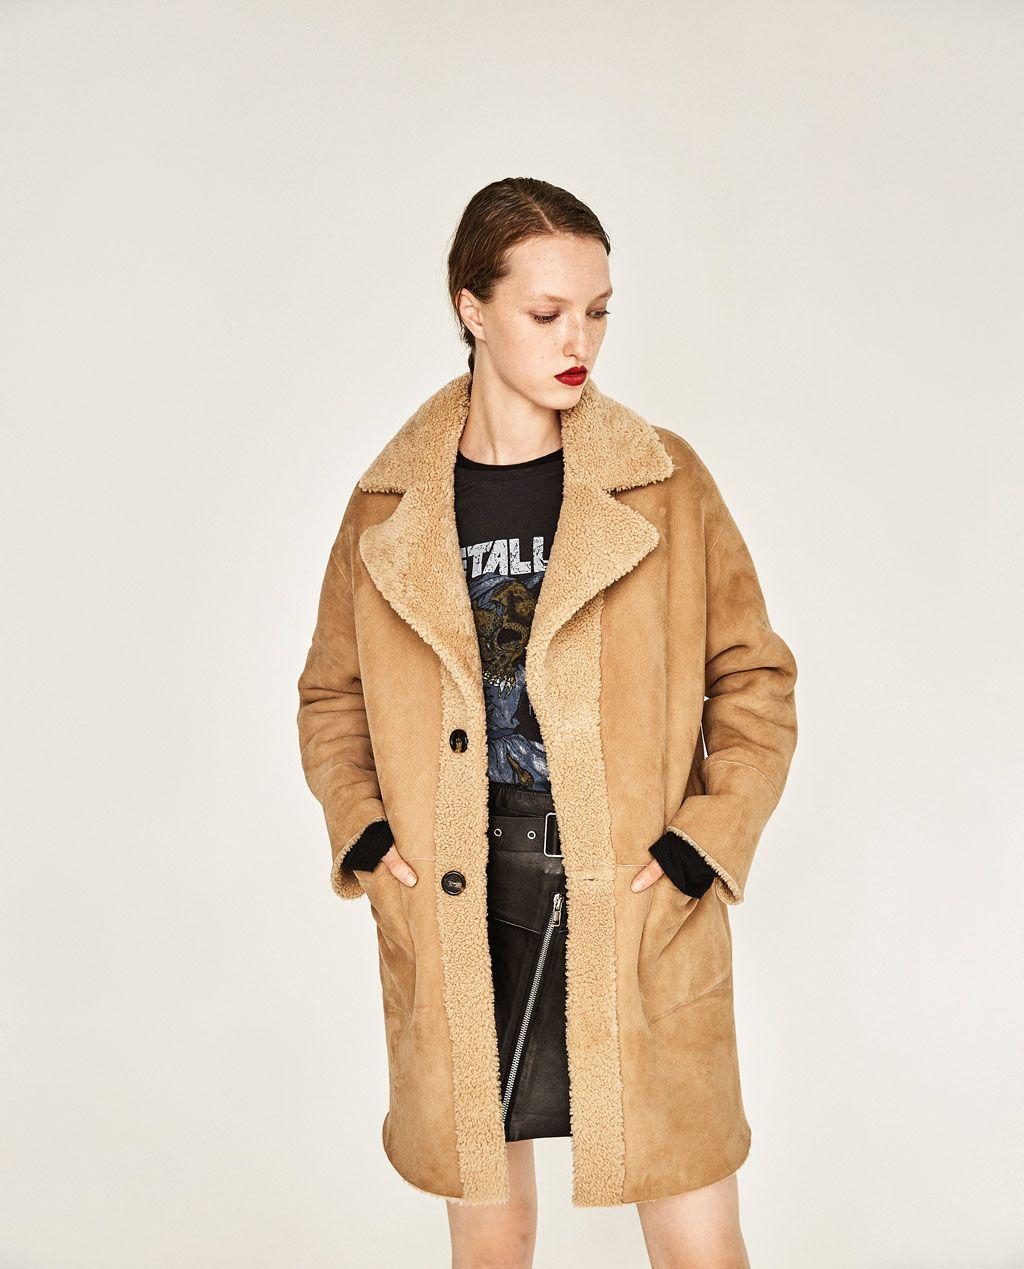 Piel Abrigos Studio Reversible 48pt4wbrq Zara Abrigo México Mujer TxwnAanEYq